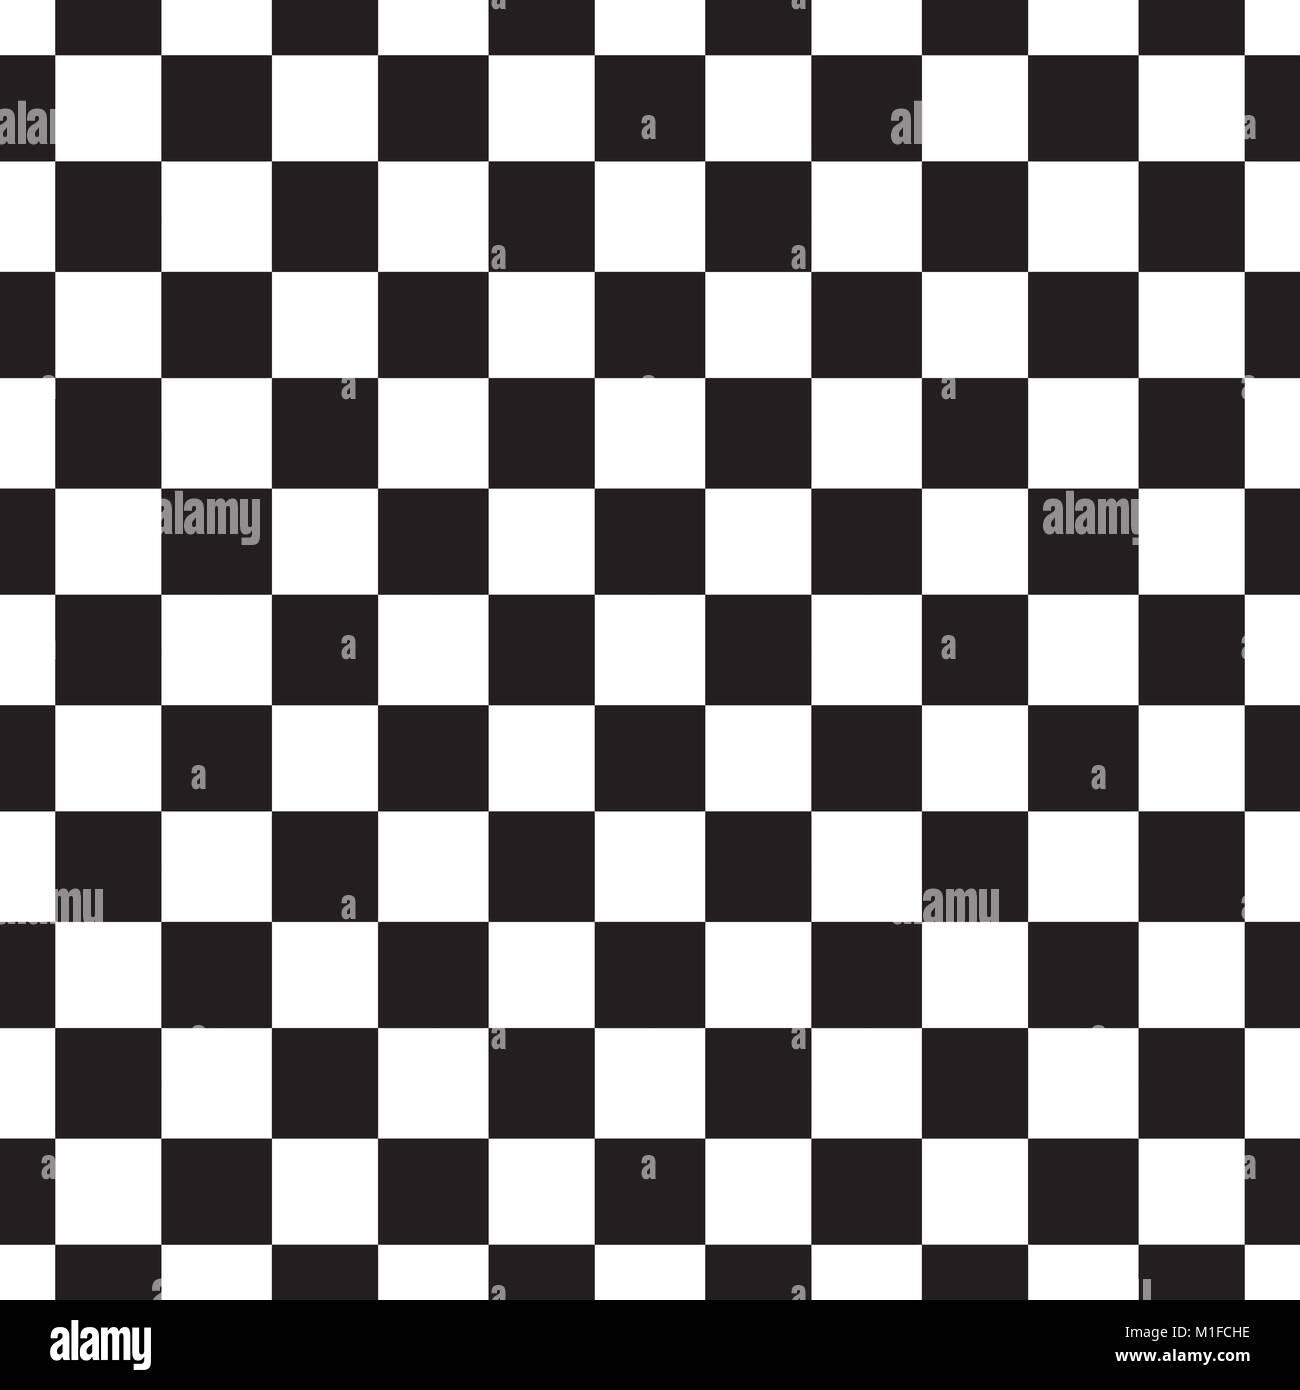 Chequered Pattern Imágenes De Stock & Chequered Pattern Fotos De ...